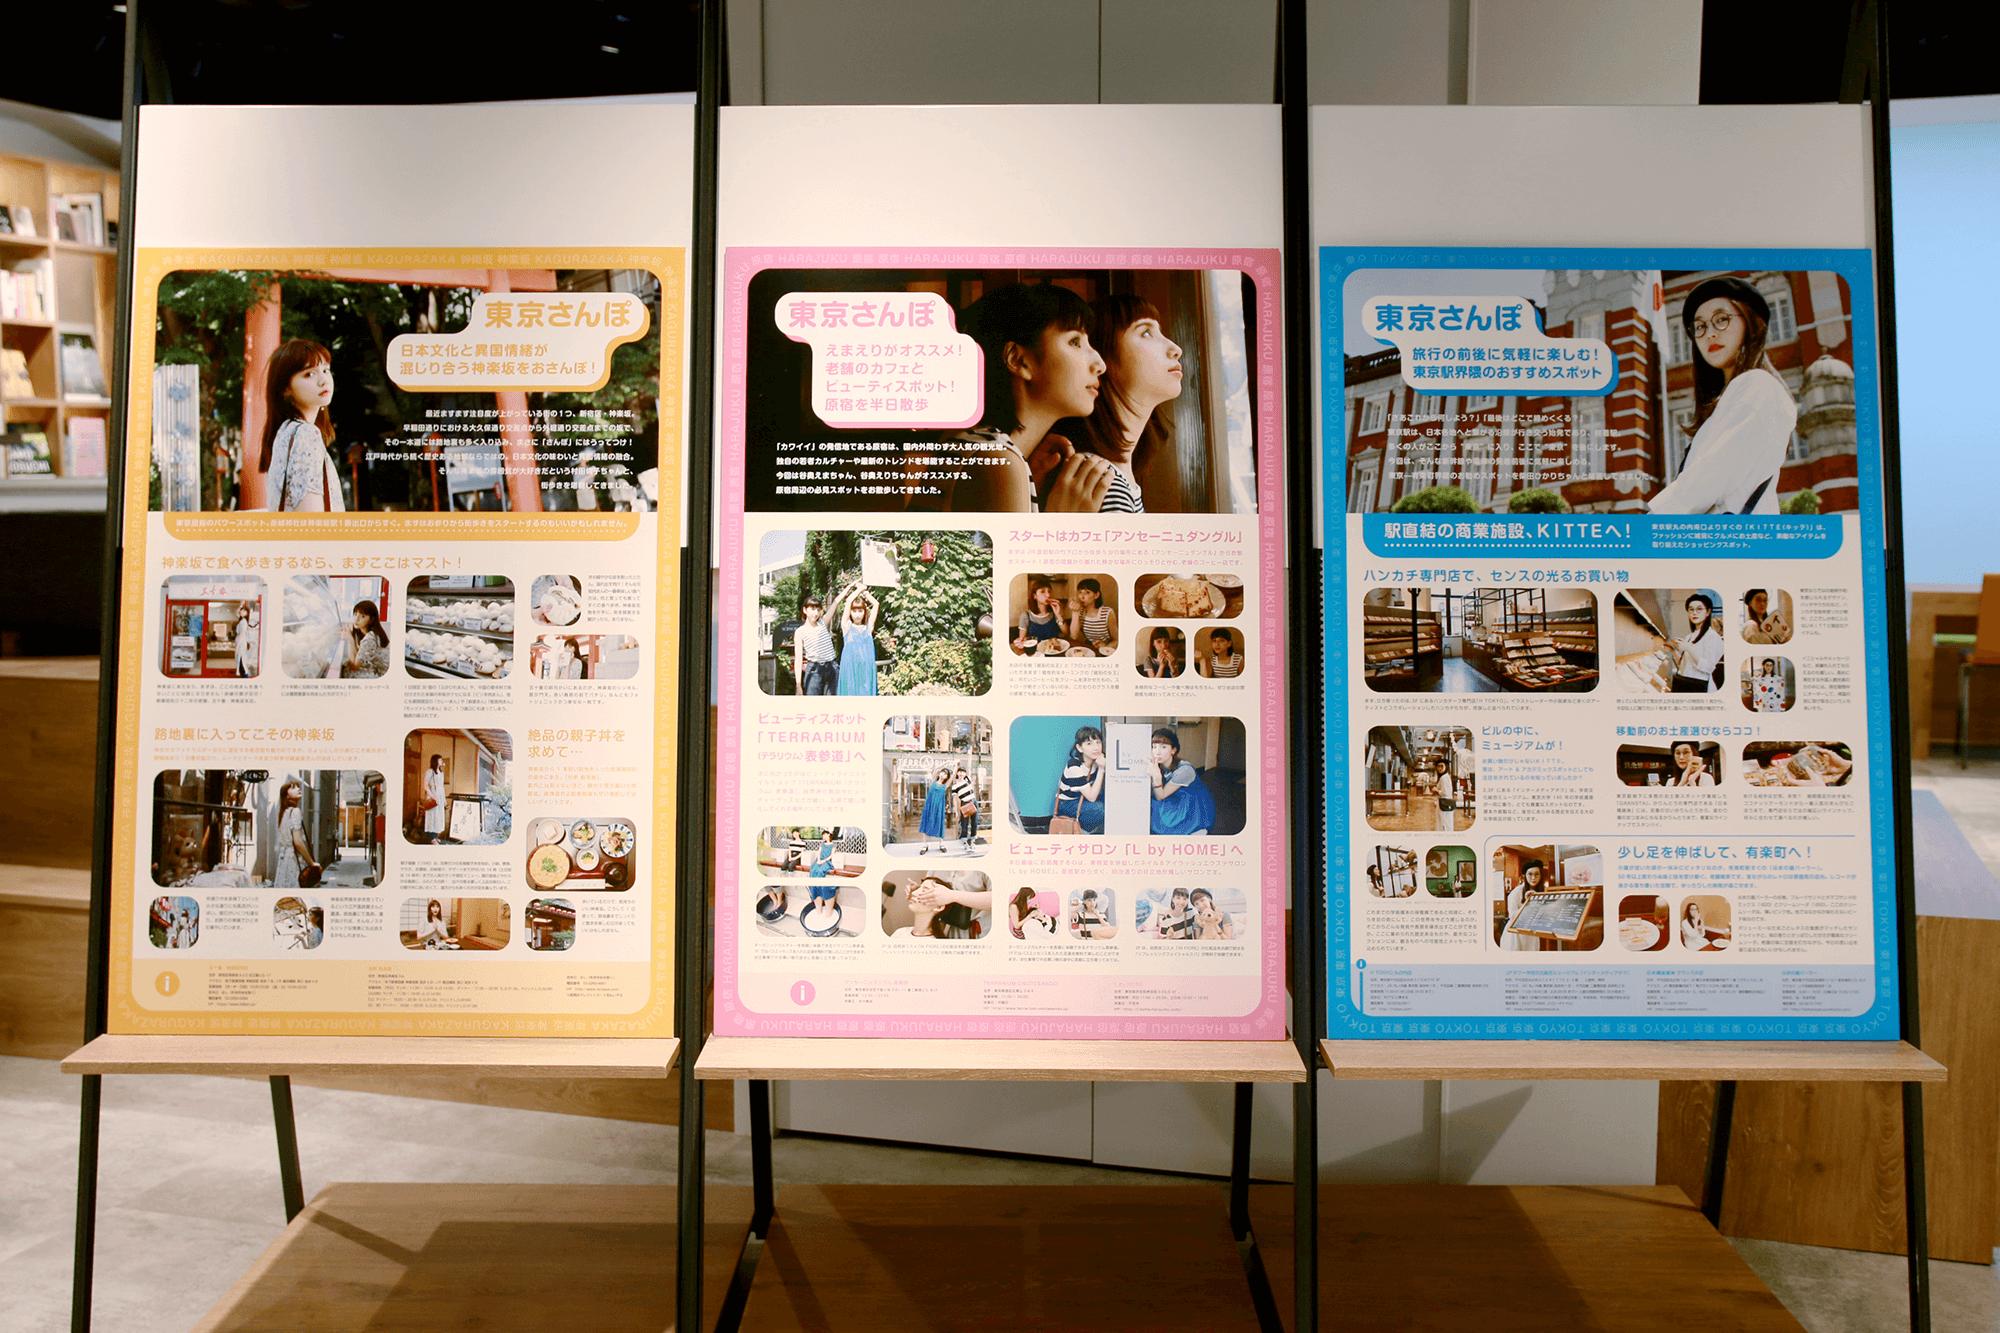 MIX_poster_jp_1